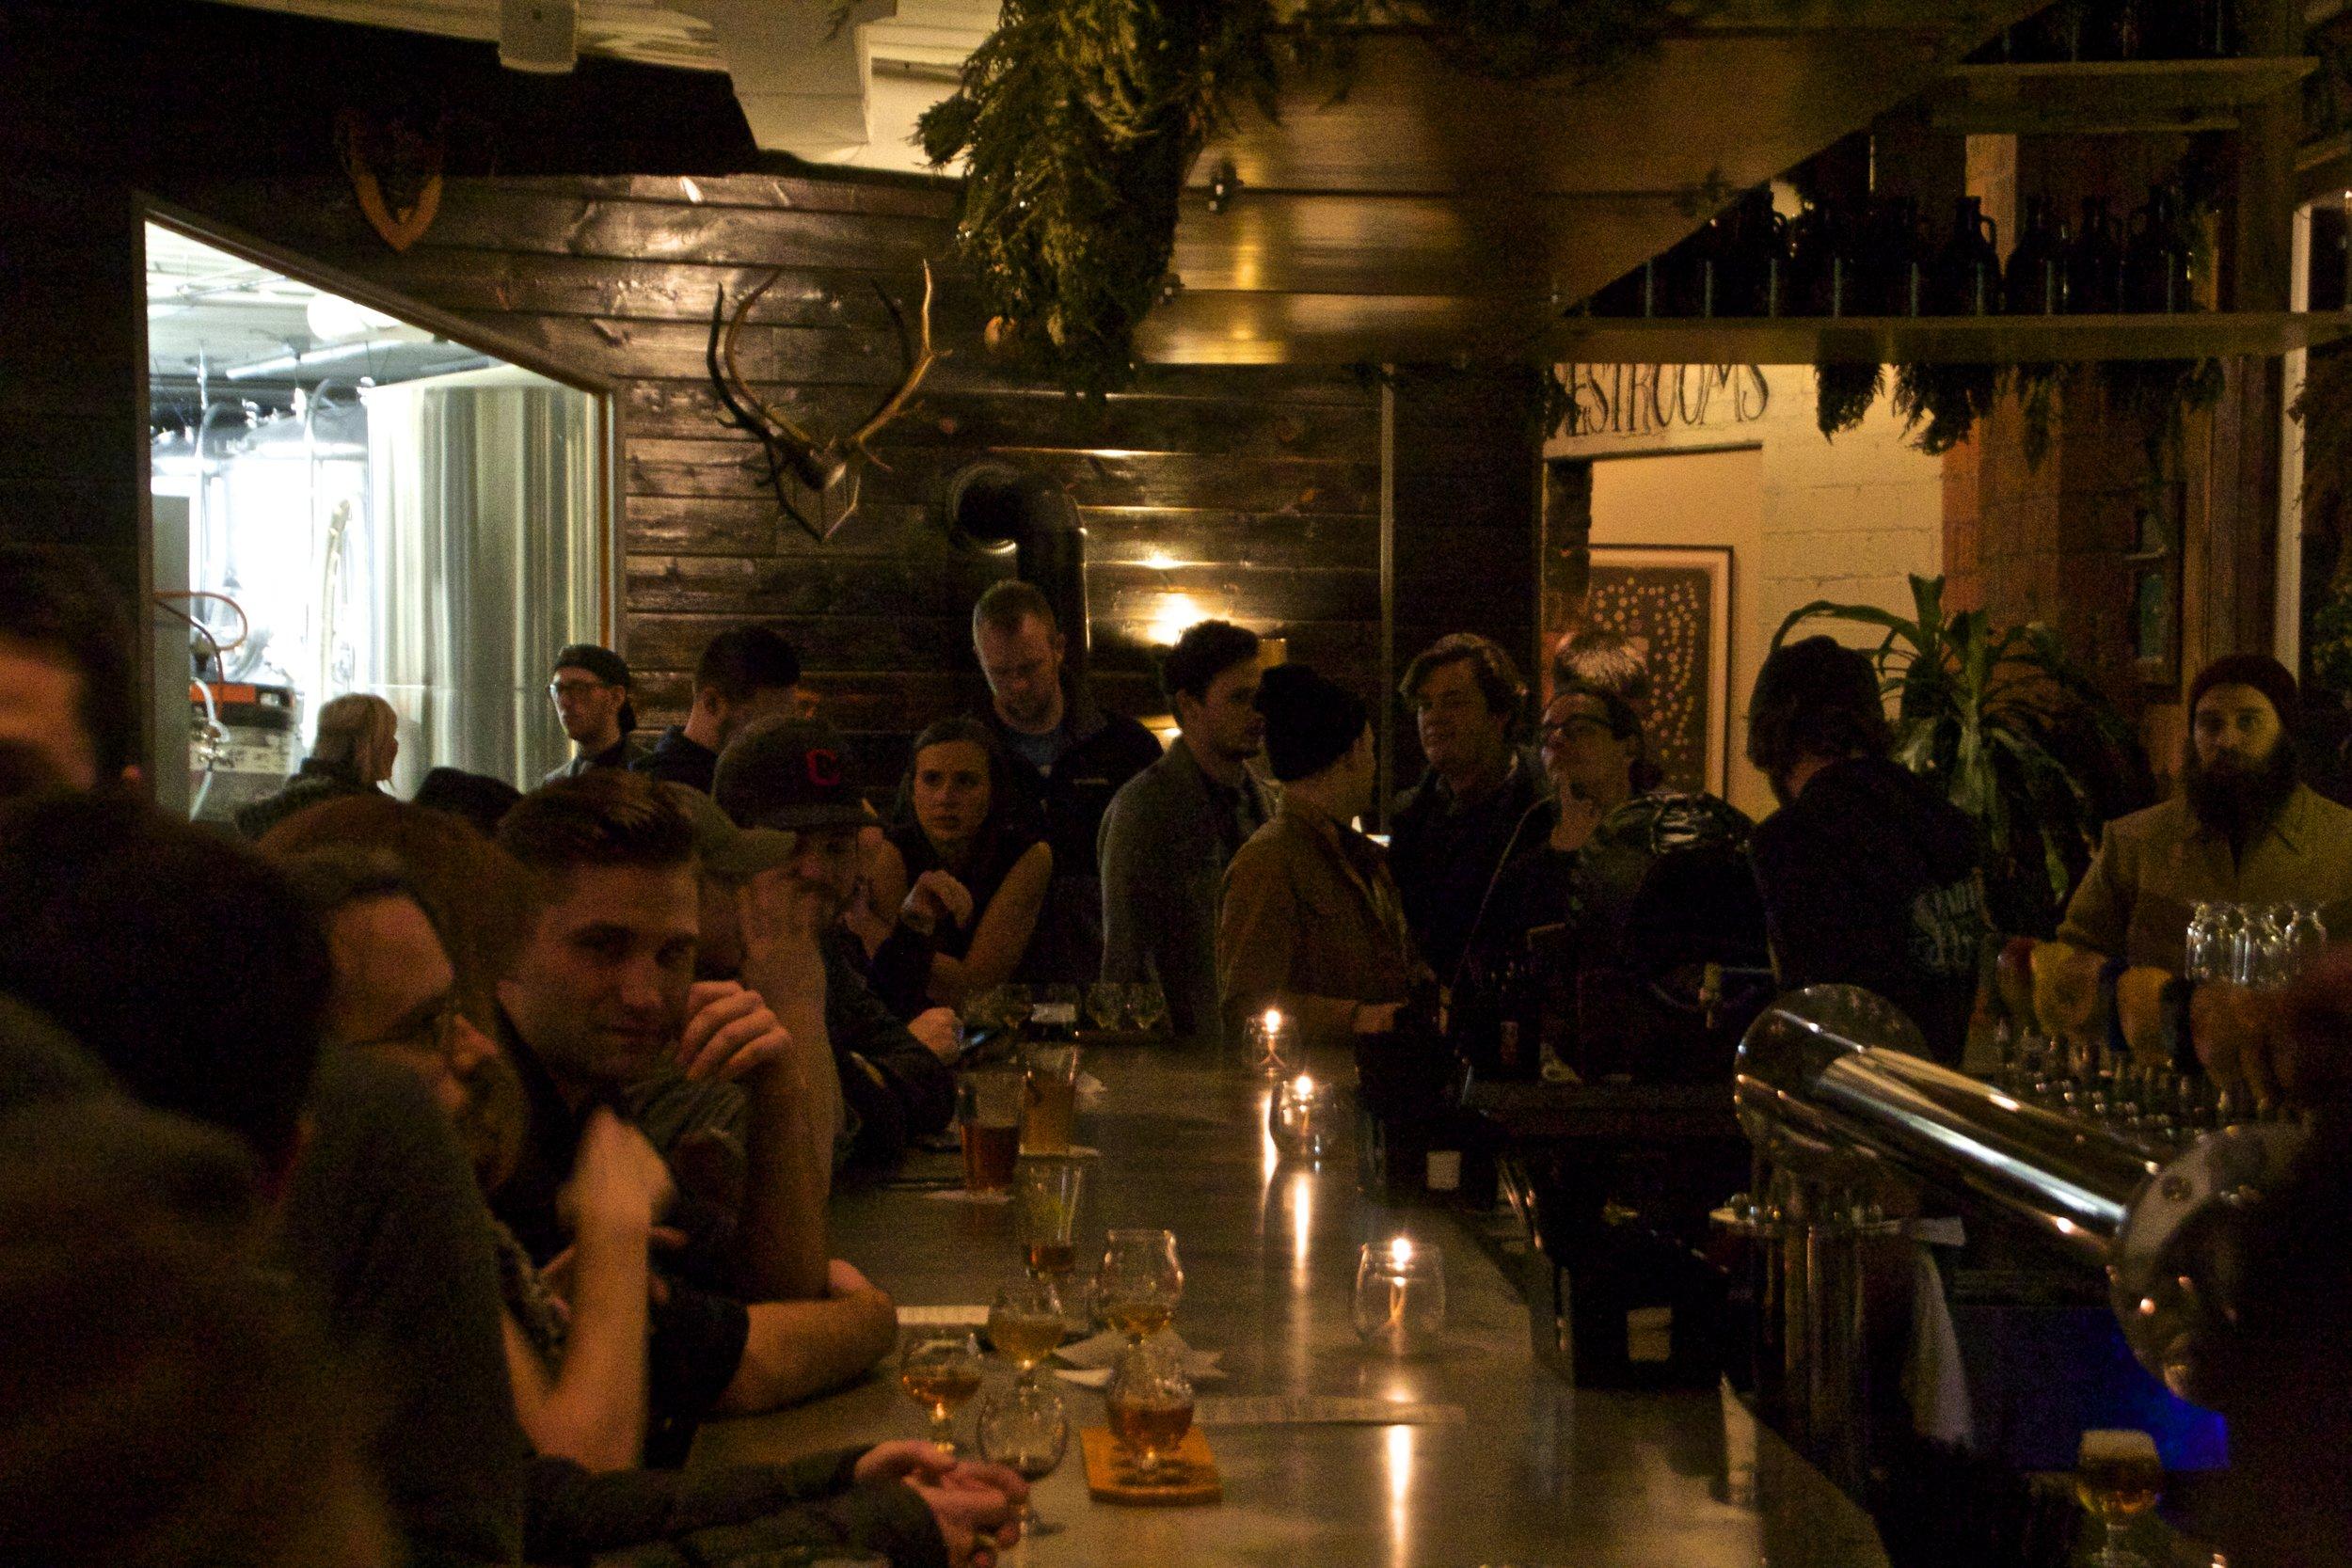 Seventh Son Brewery Columbus Ohio Bars 3.jpg